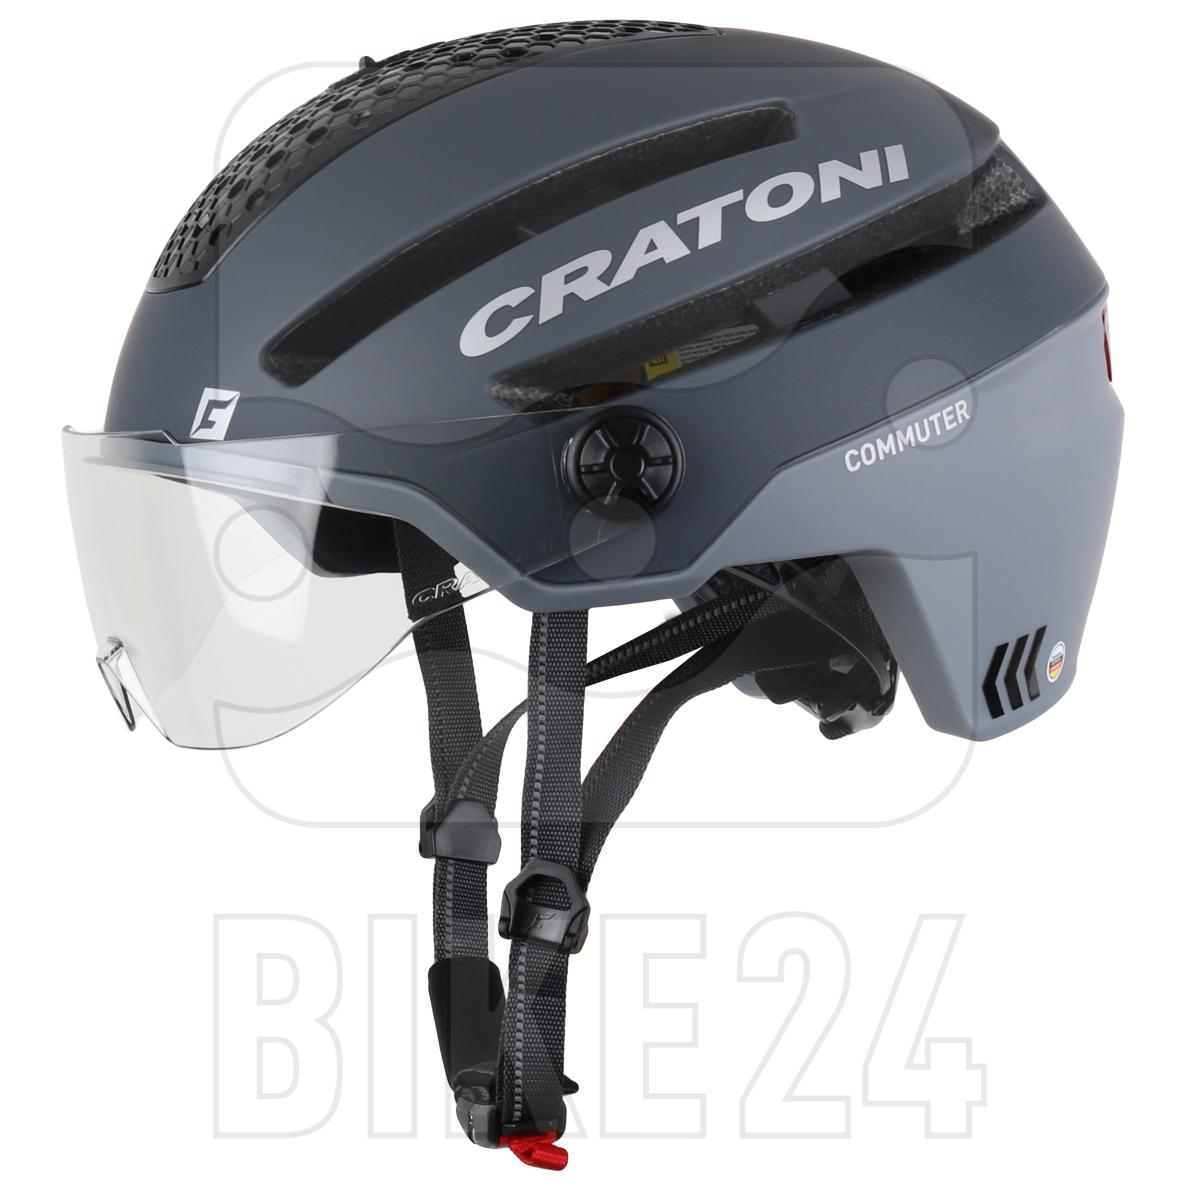 CRATONI Commuter Helmet - grey matt